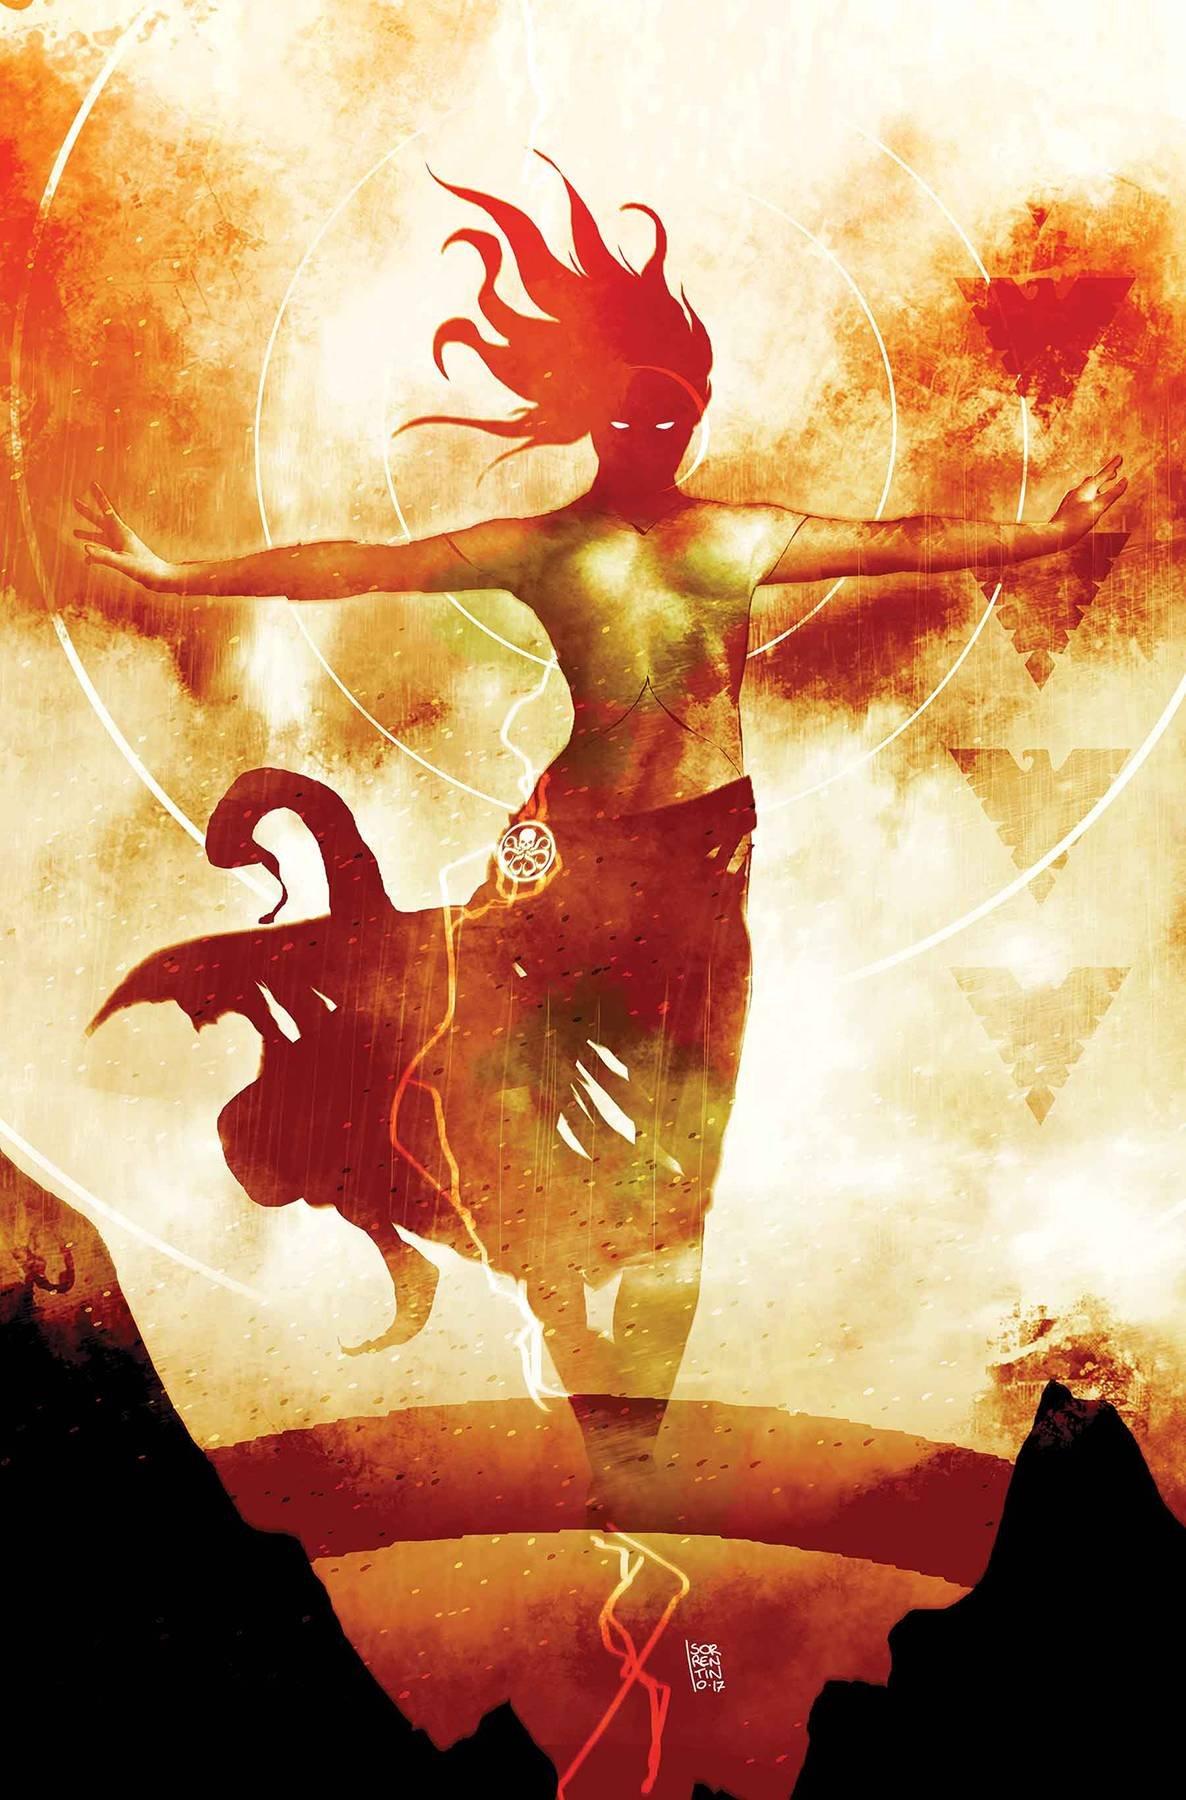 Download SECRET EMPIRE #2 (OF 9) SORRENTINO HYDRA HEROES VAR Release Date 5/17/17 ebook